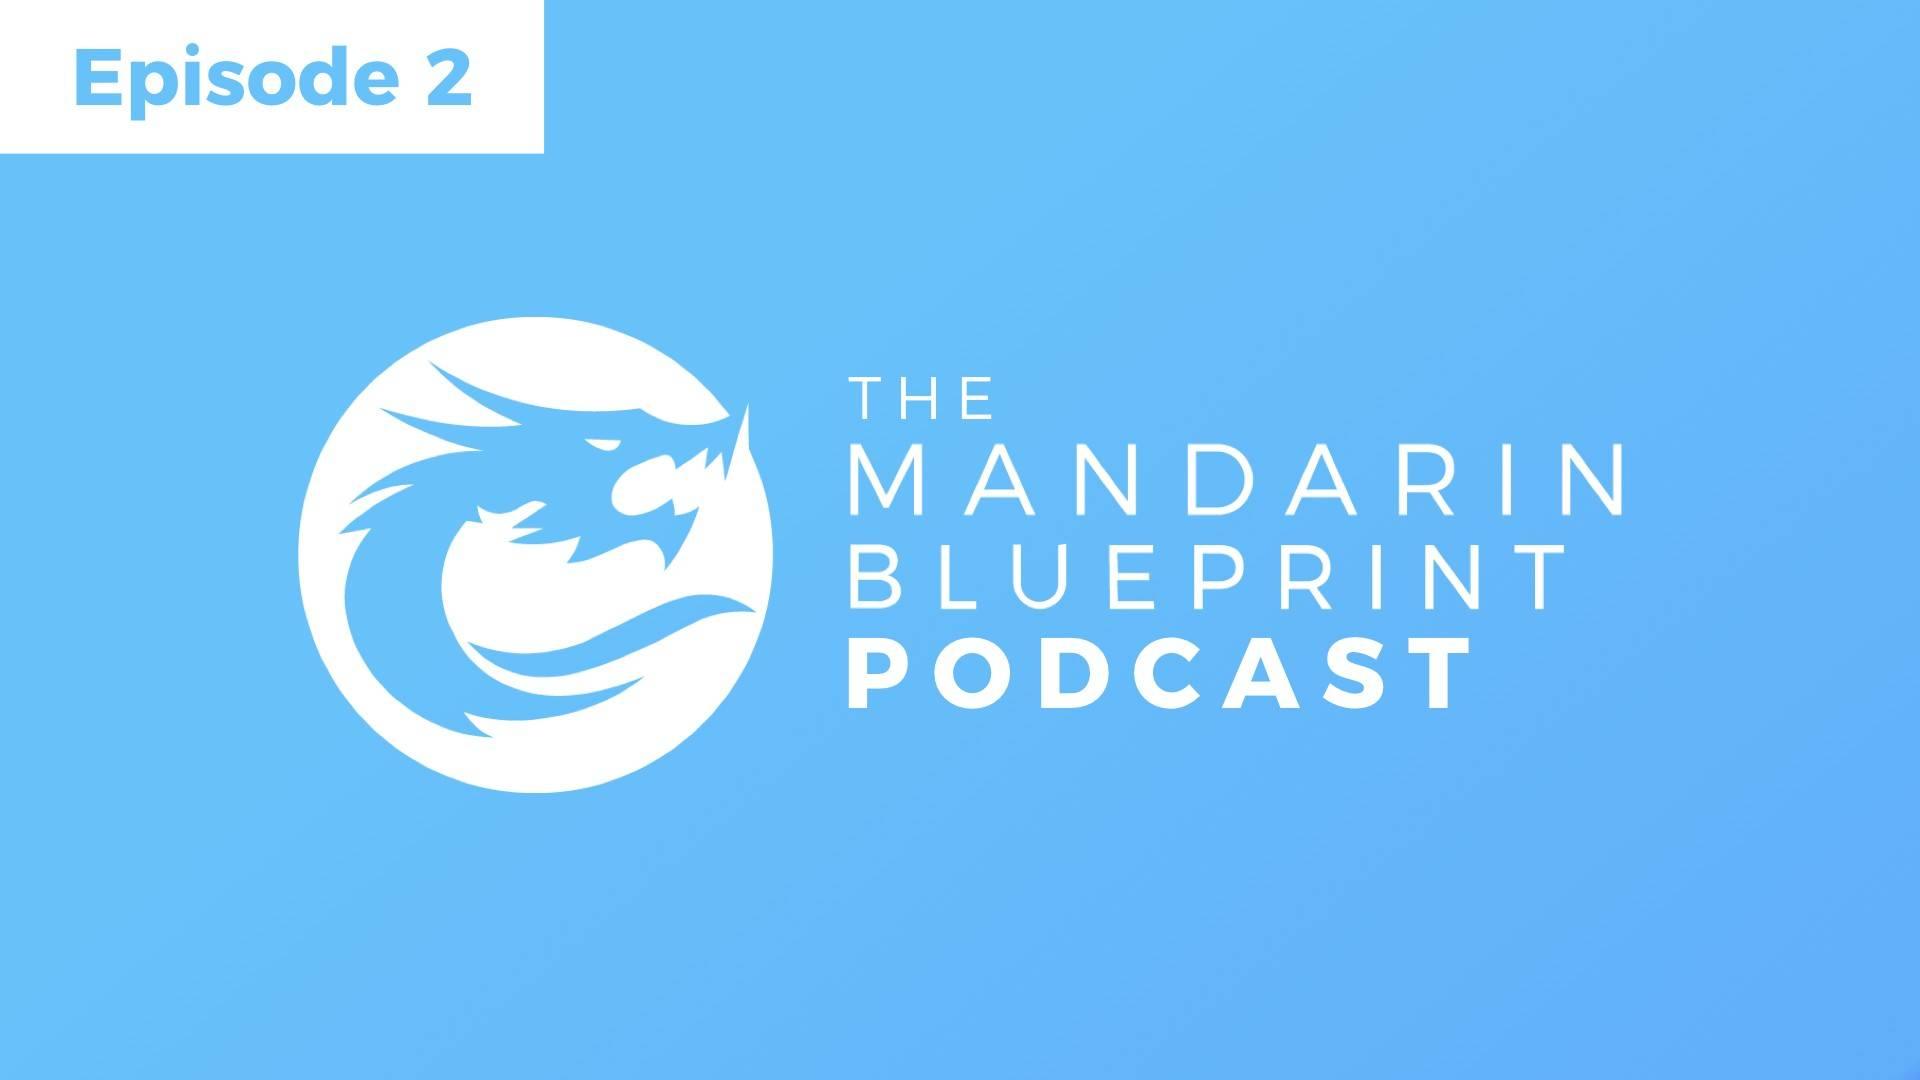 2 The Mild Annoyance Of My Grandpa Mandarin Blueprint